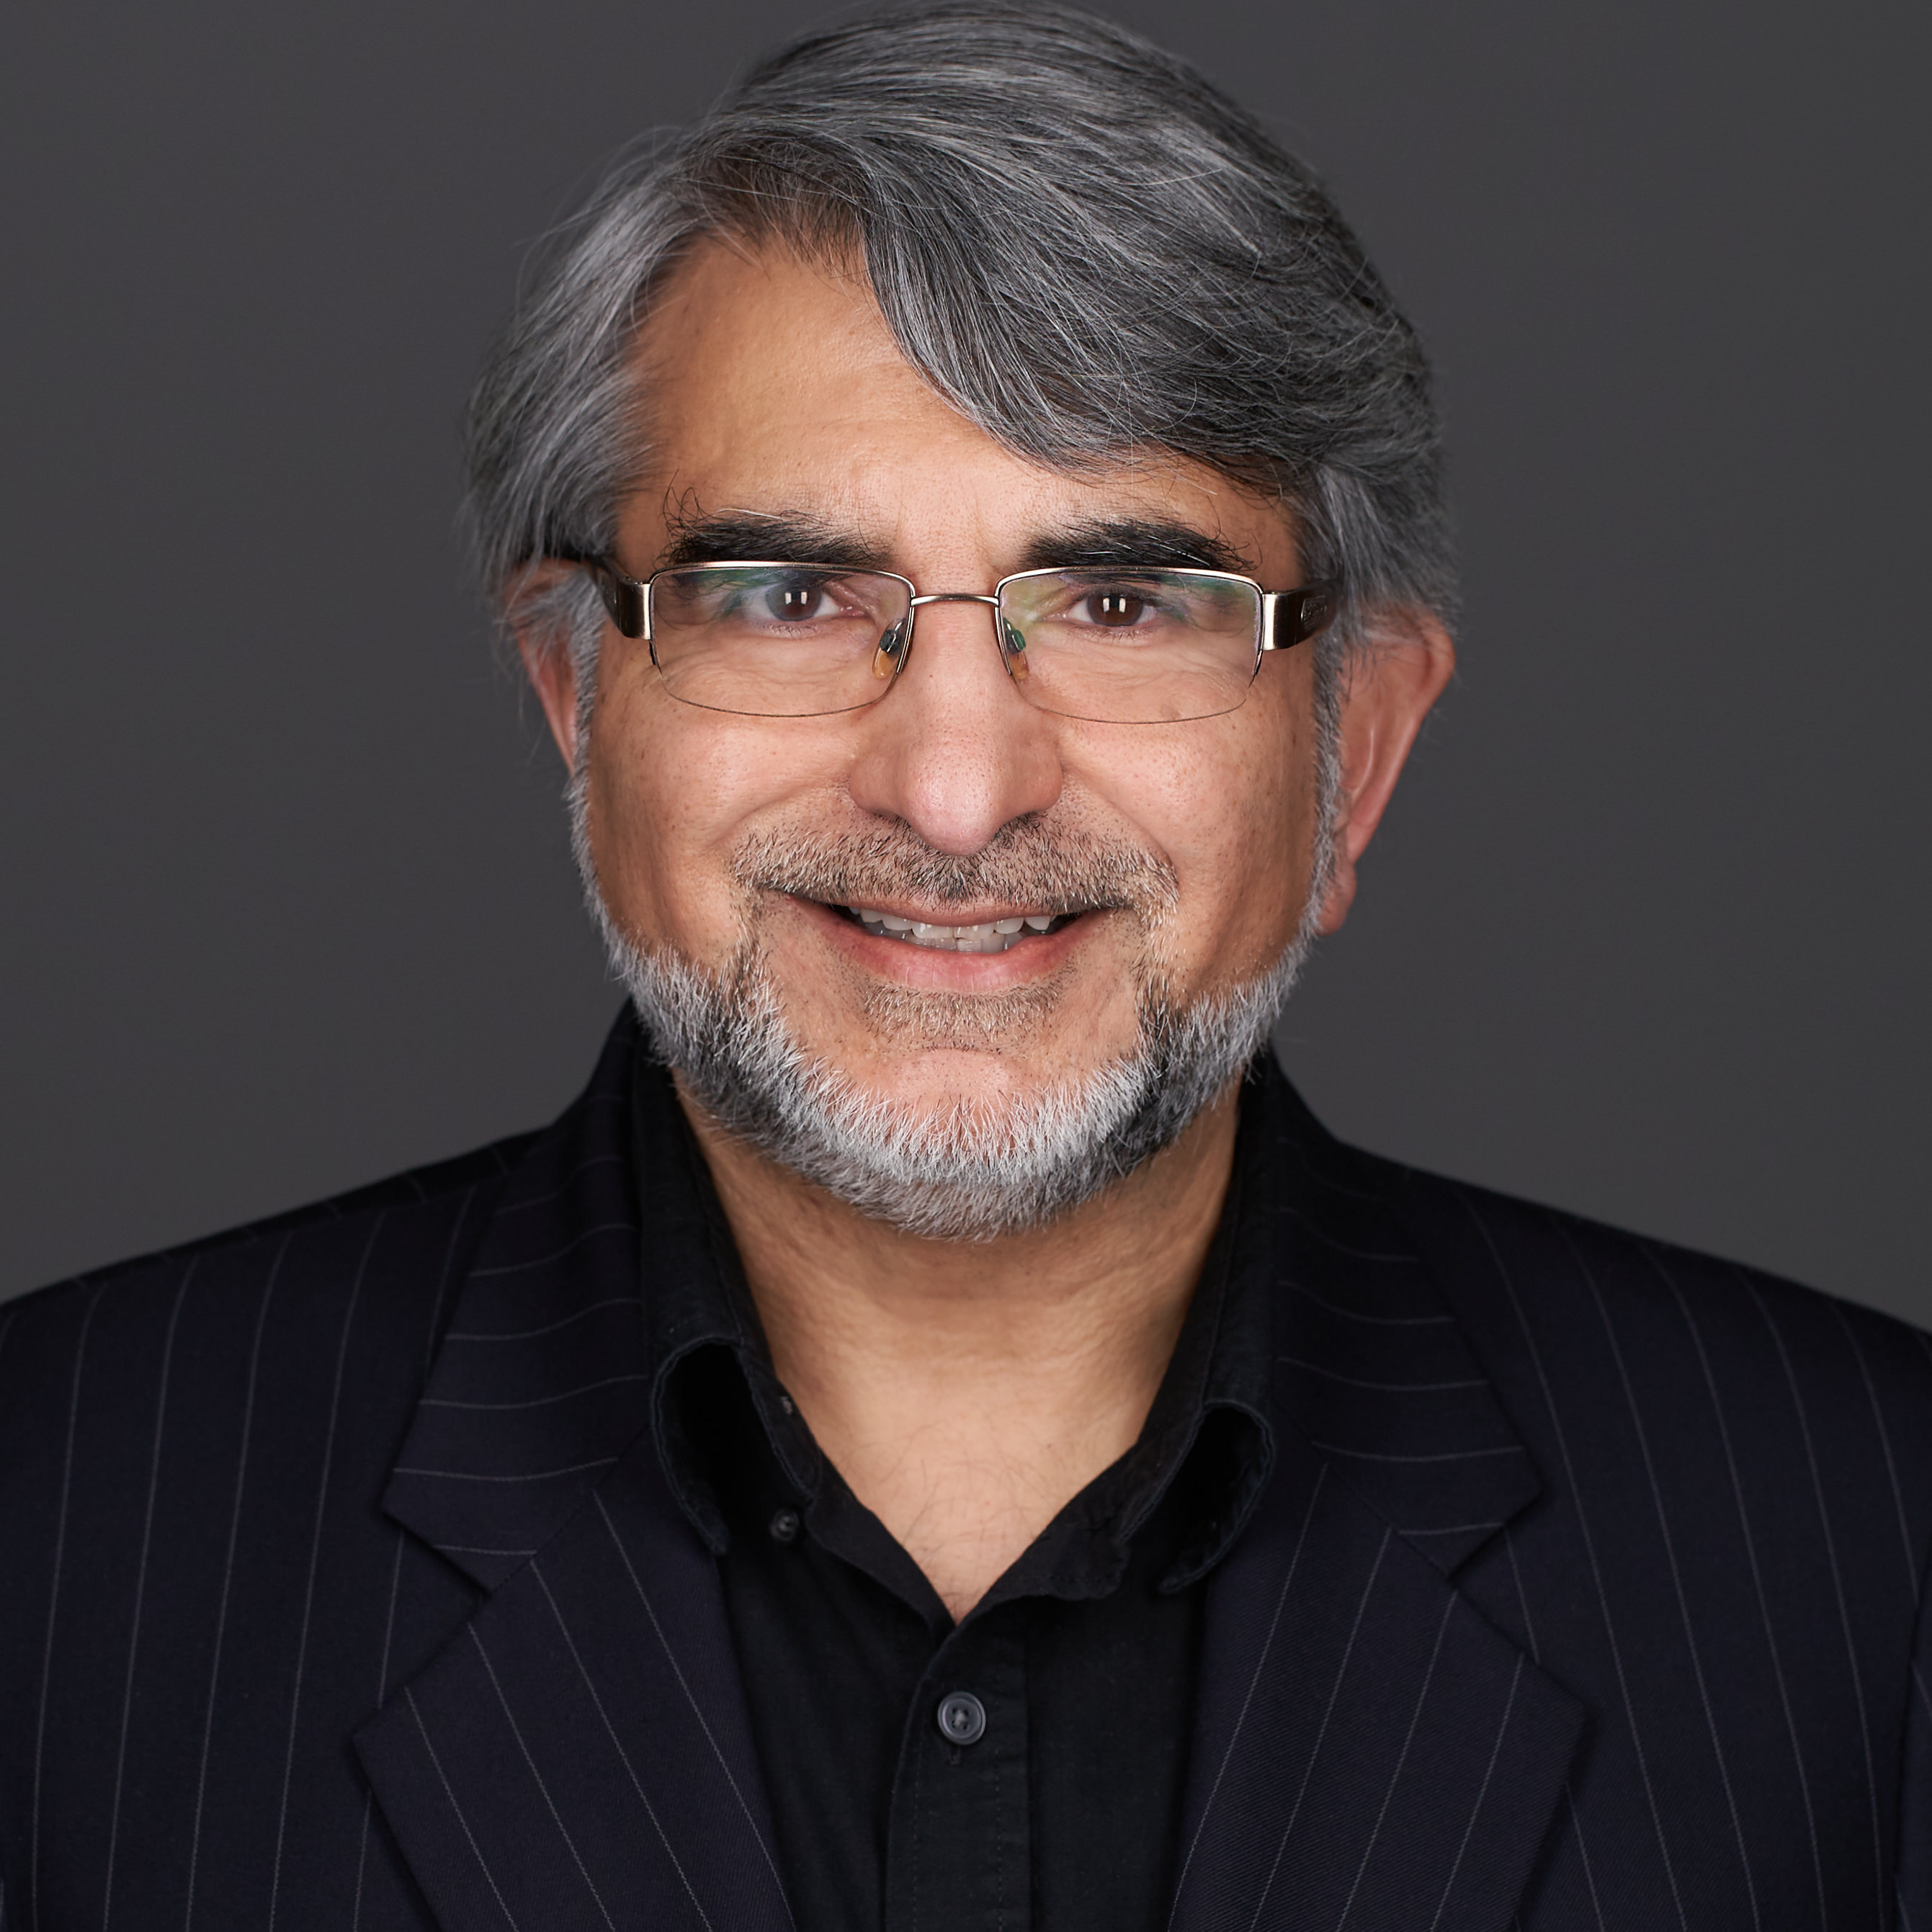 Arjun G Yodh